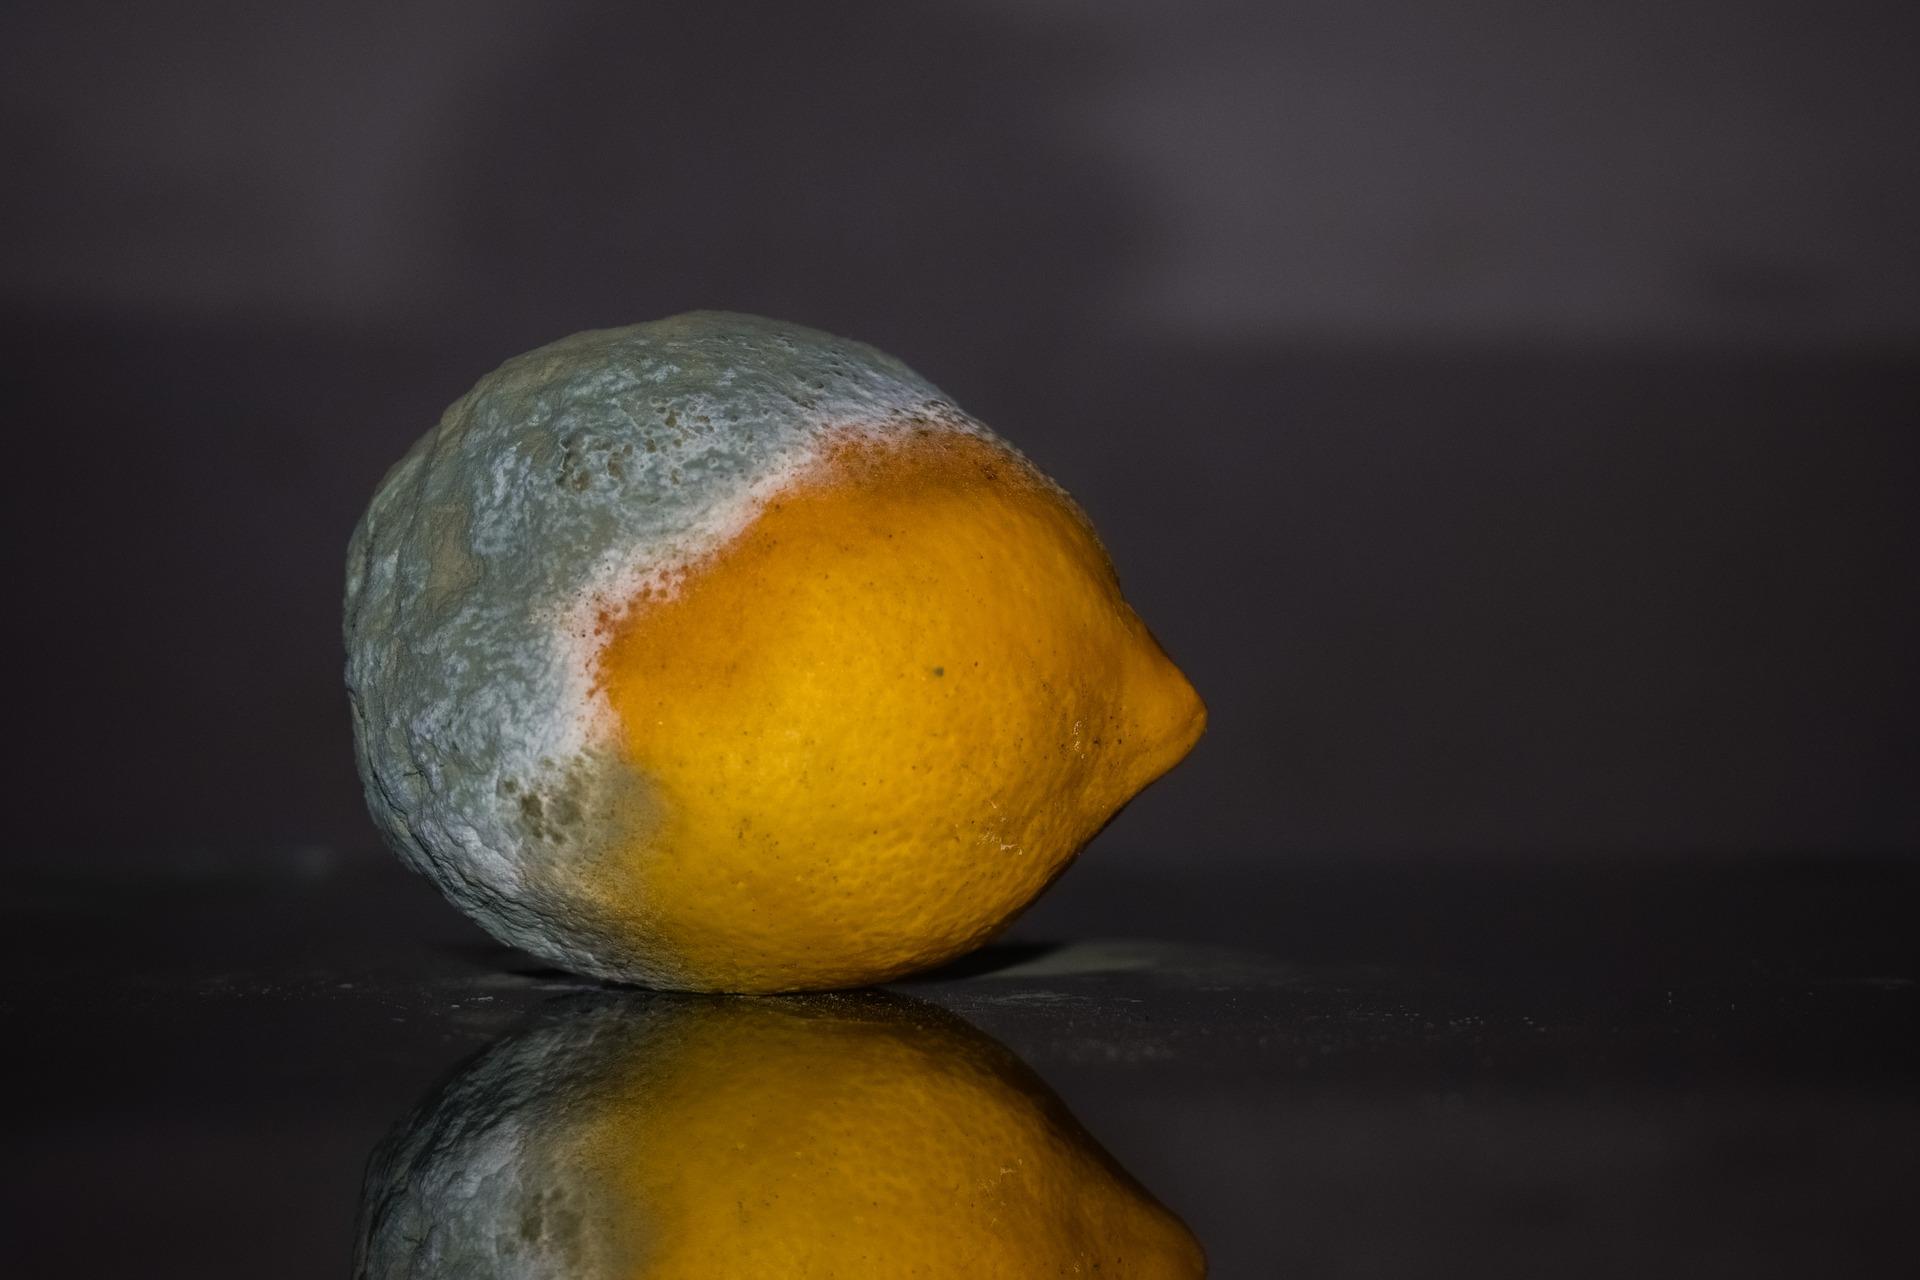 lemon-2146987_1920.jpg